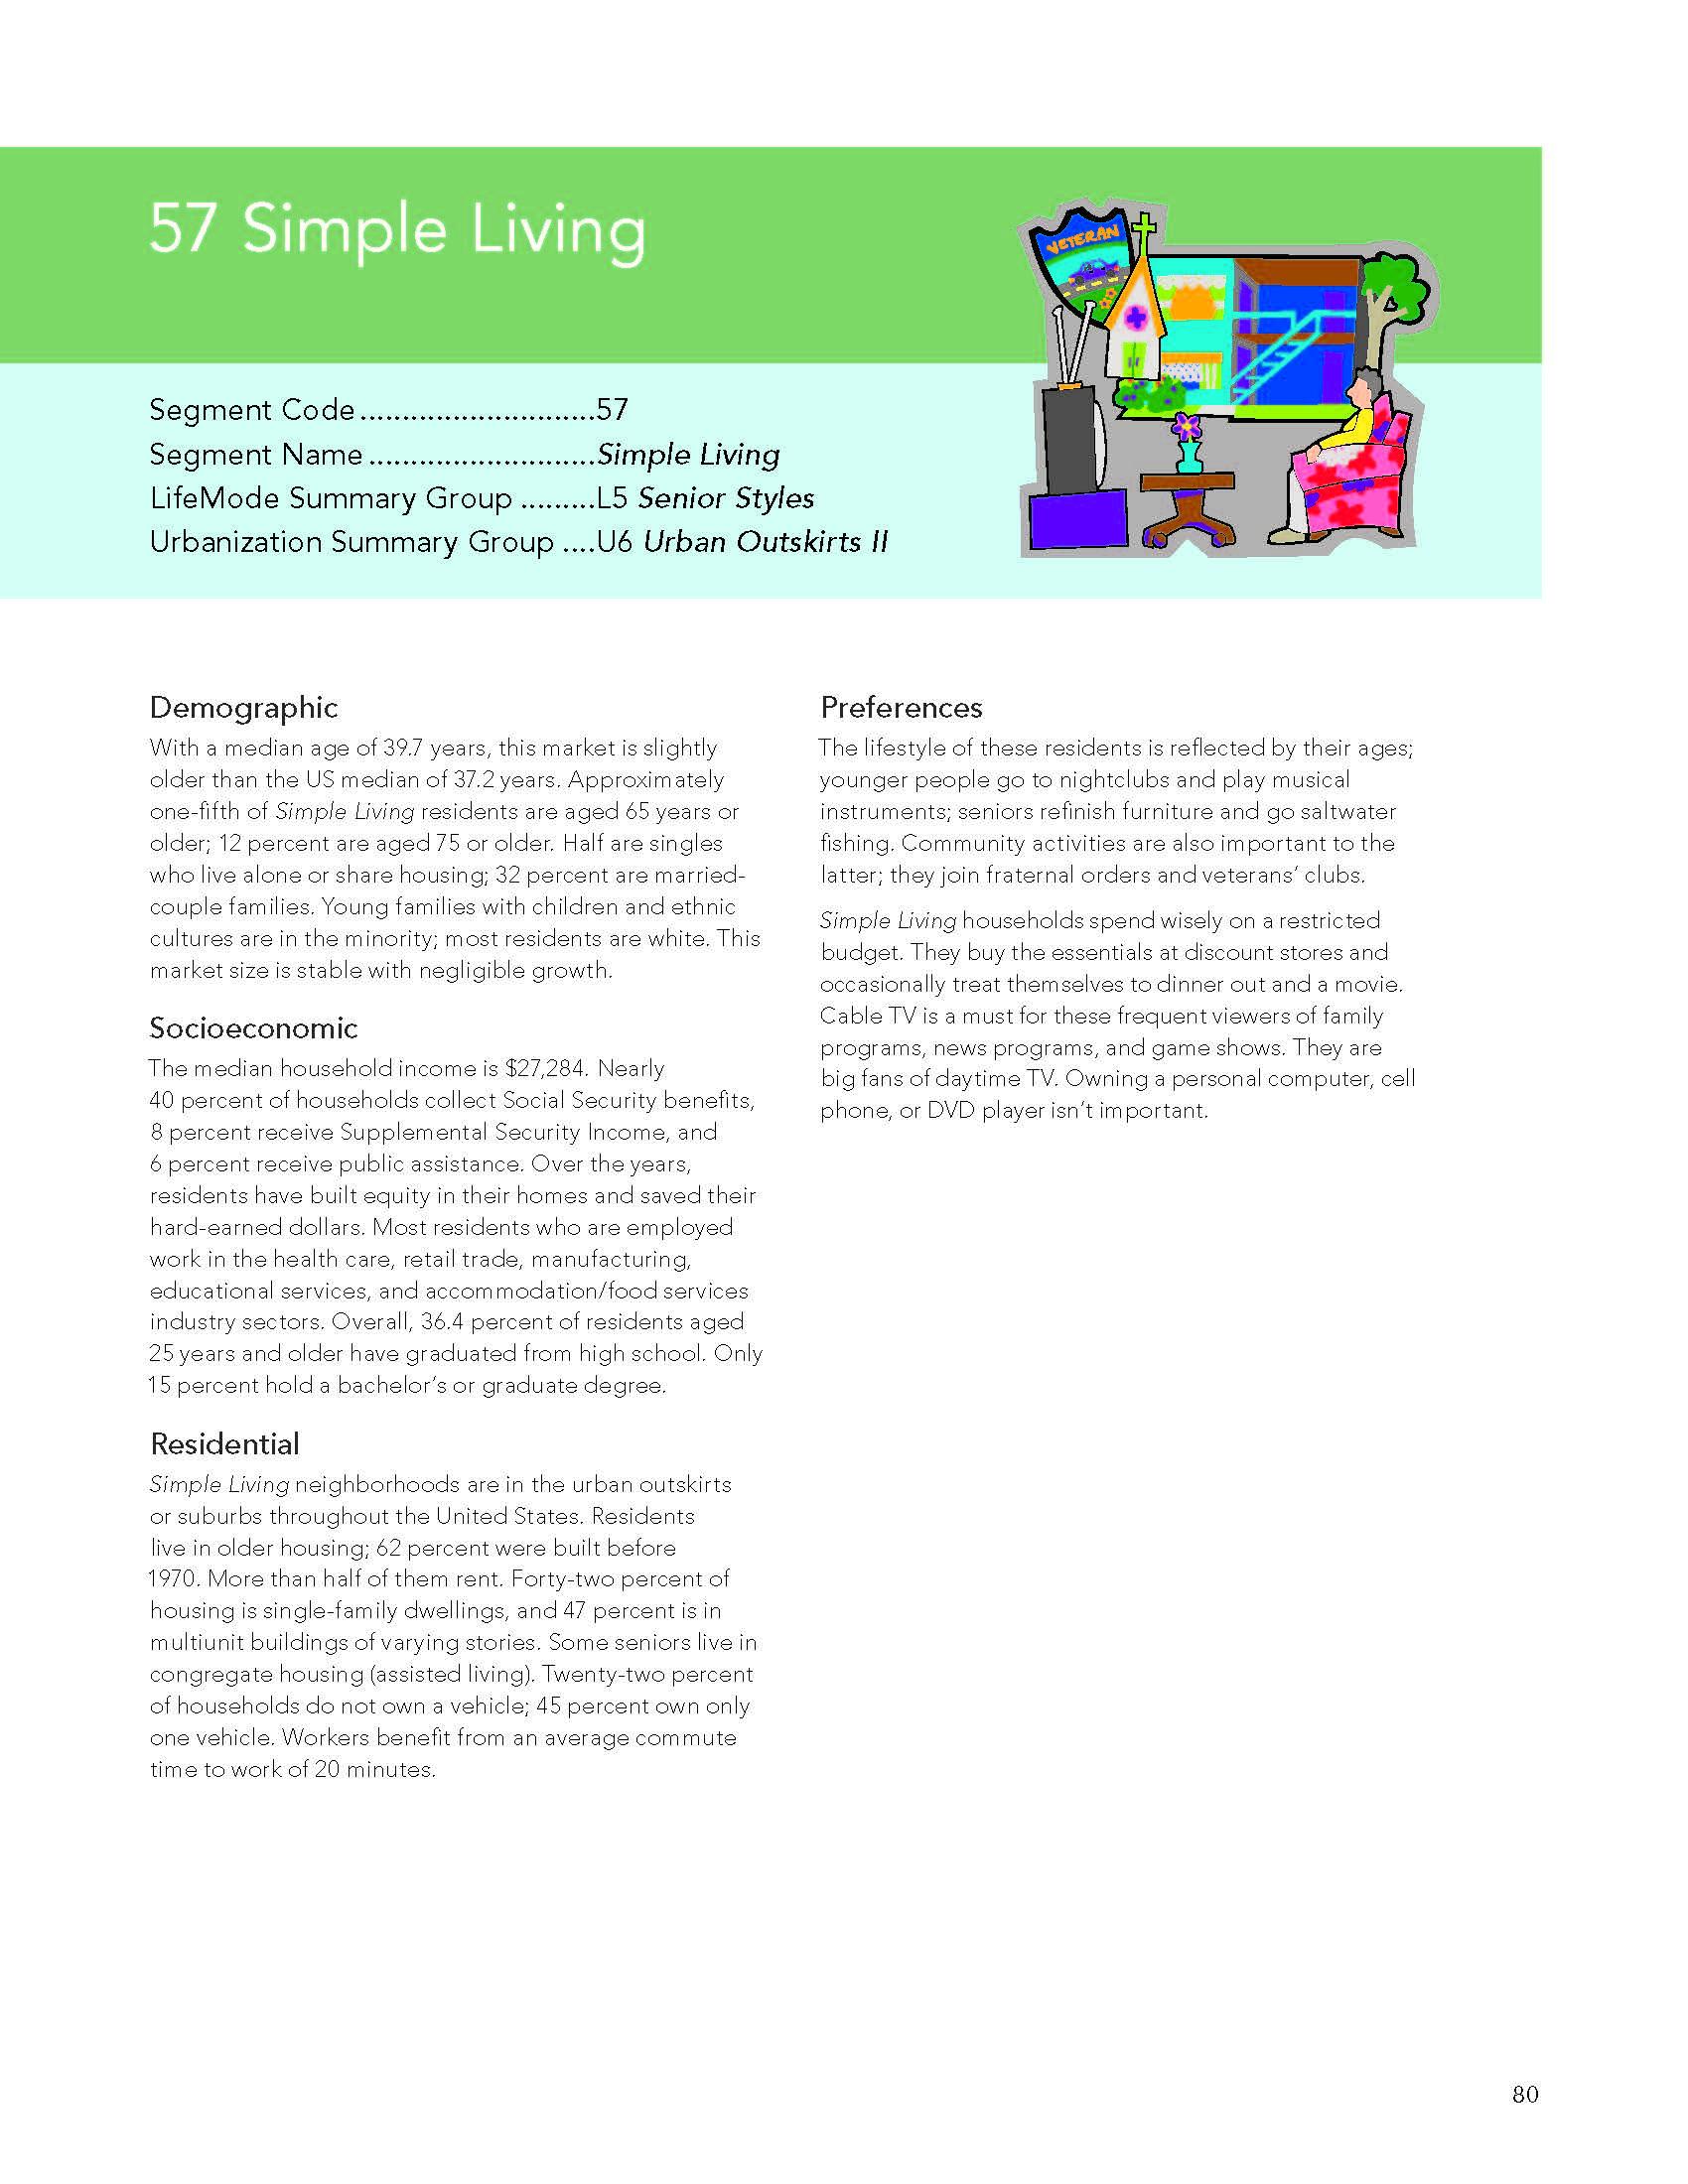 tapestry-segmentation_Page_83.jpg